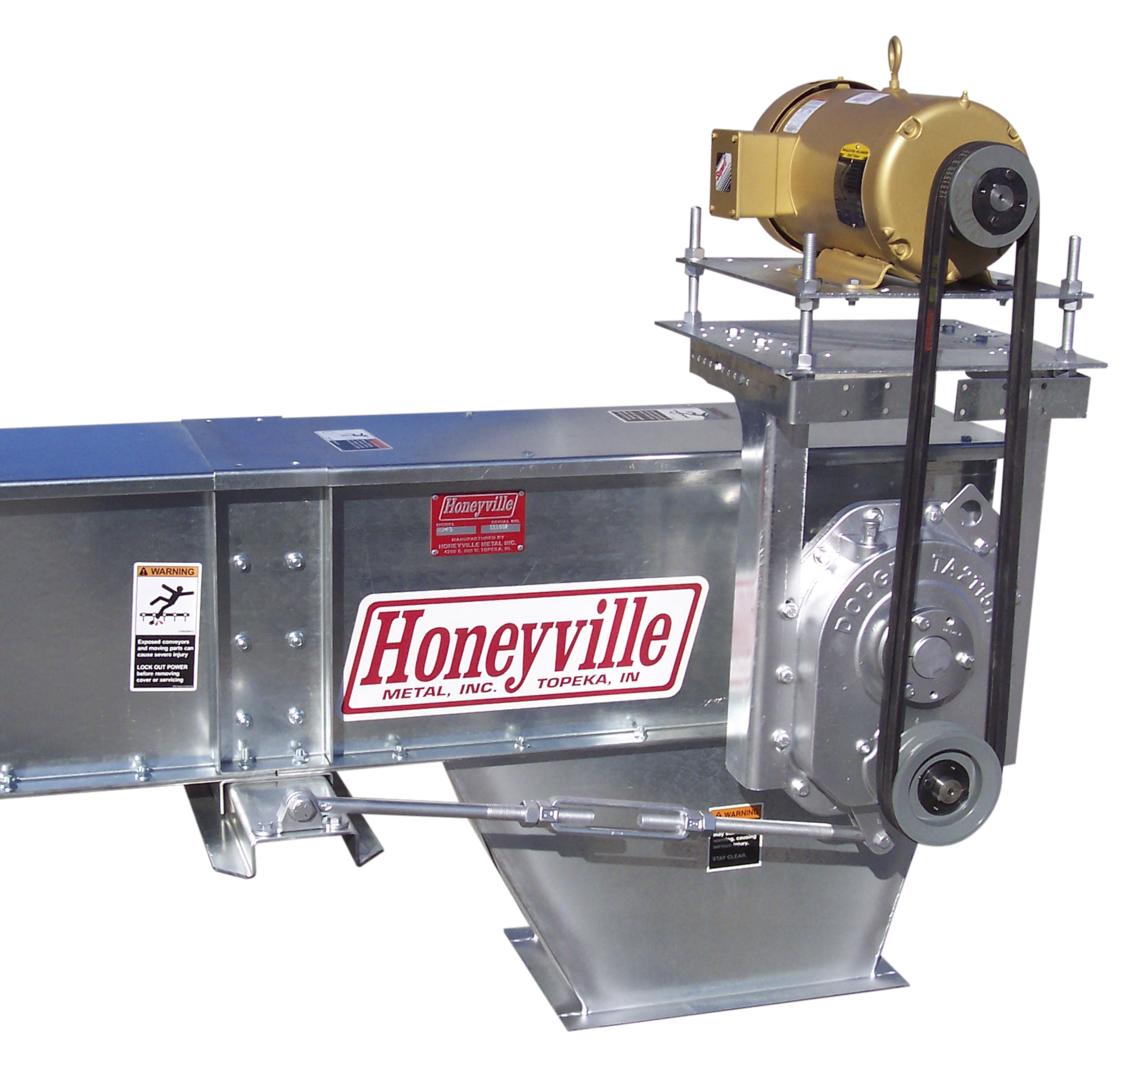 Horizontal Drag Conveyors Honeyville Metal Inc